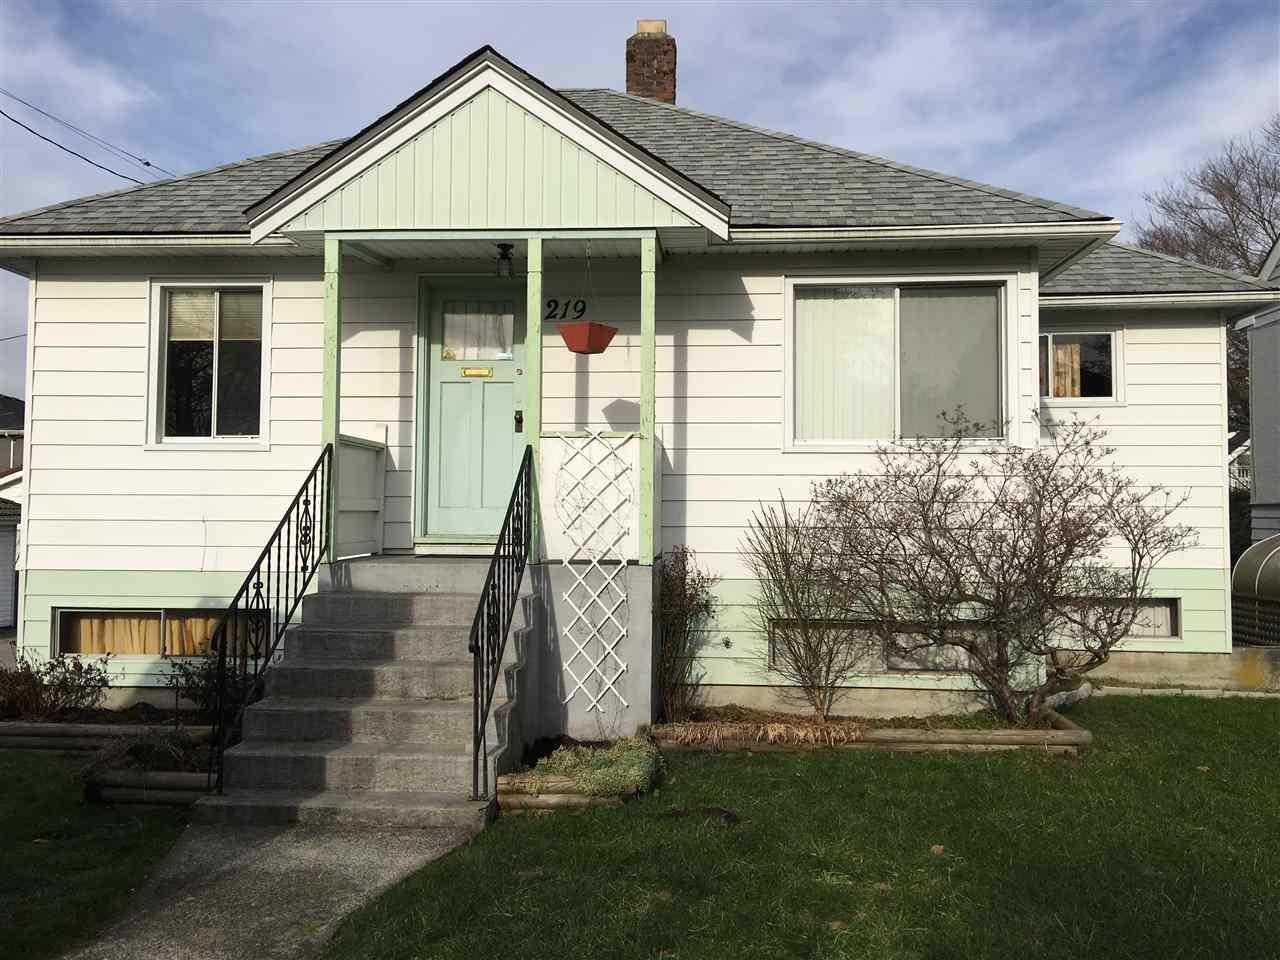 R2134207 - 219 E 40TH AVENUE, Main, Vancouver, BC - House/Single Family